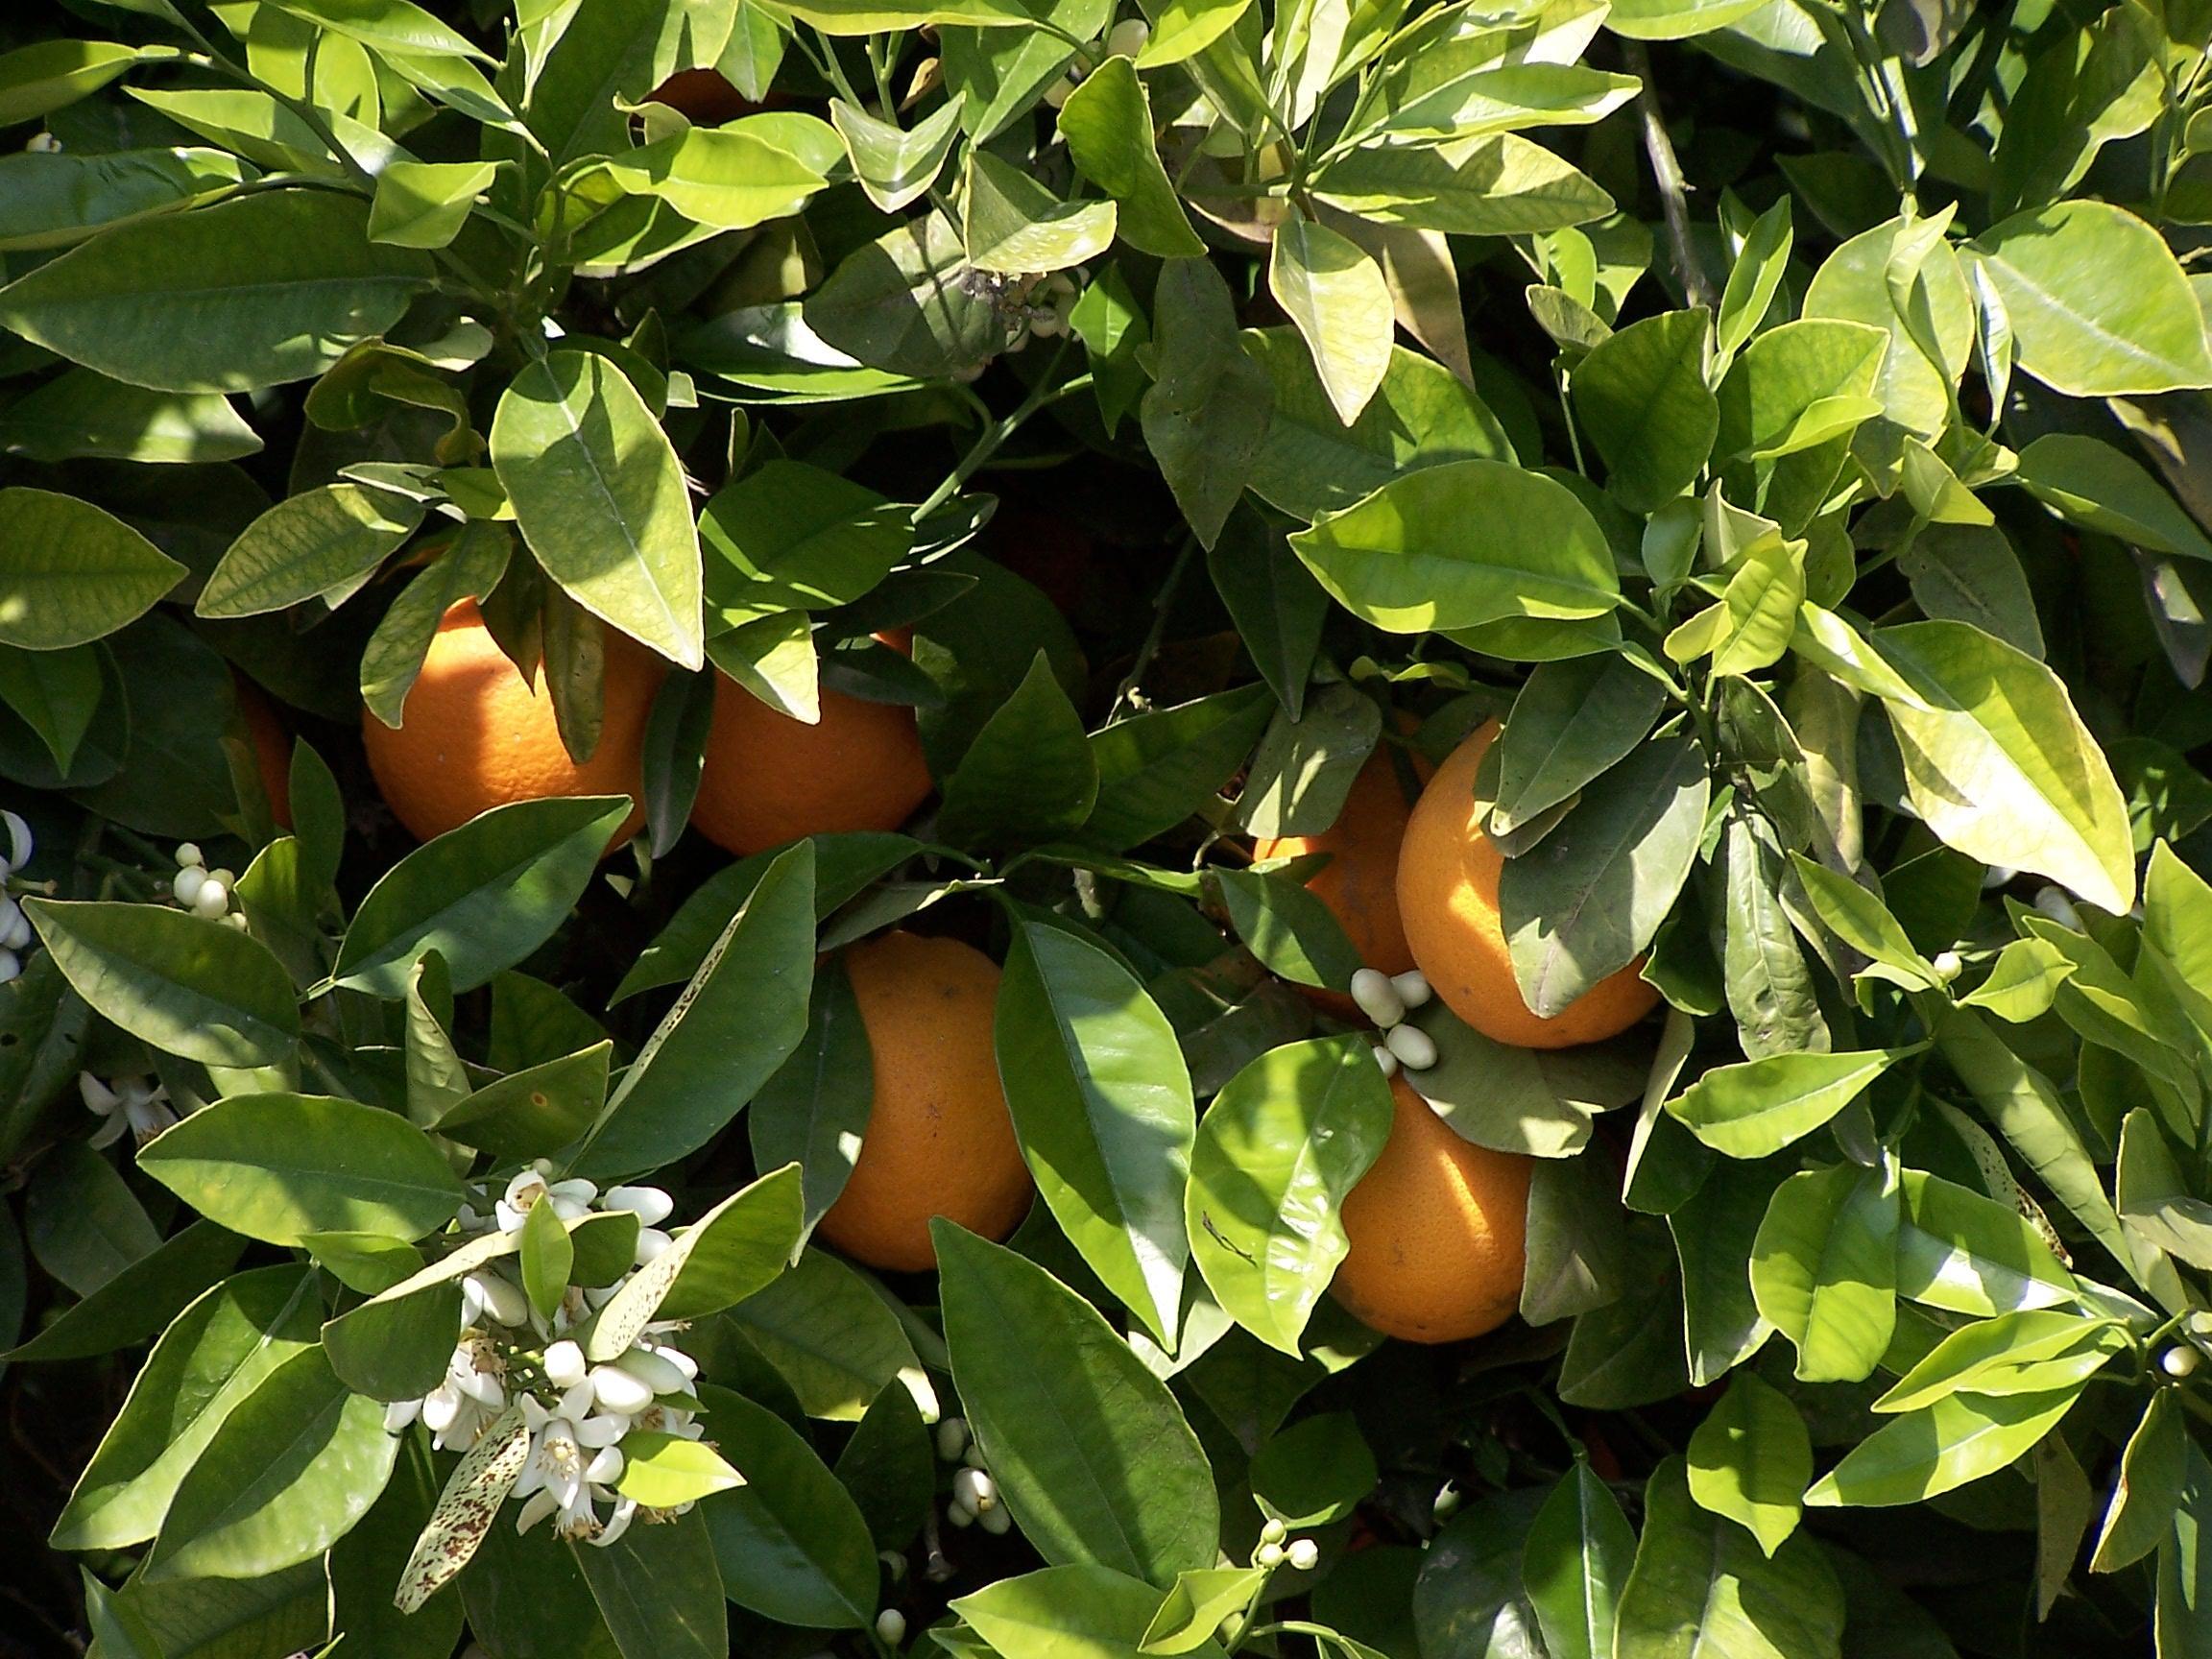 Naranjos de Elche naturalmente sanos